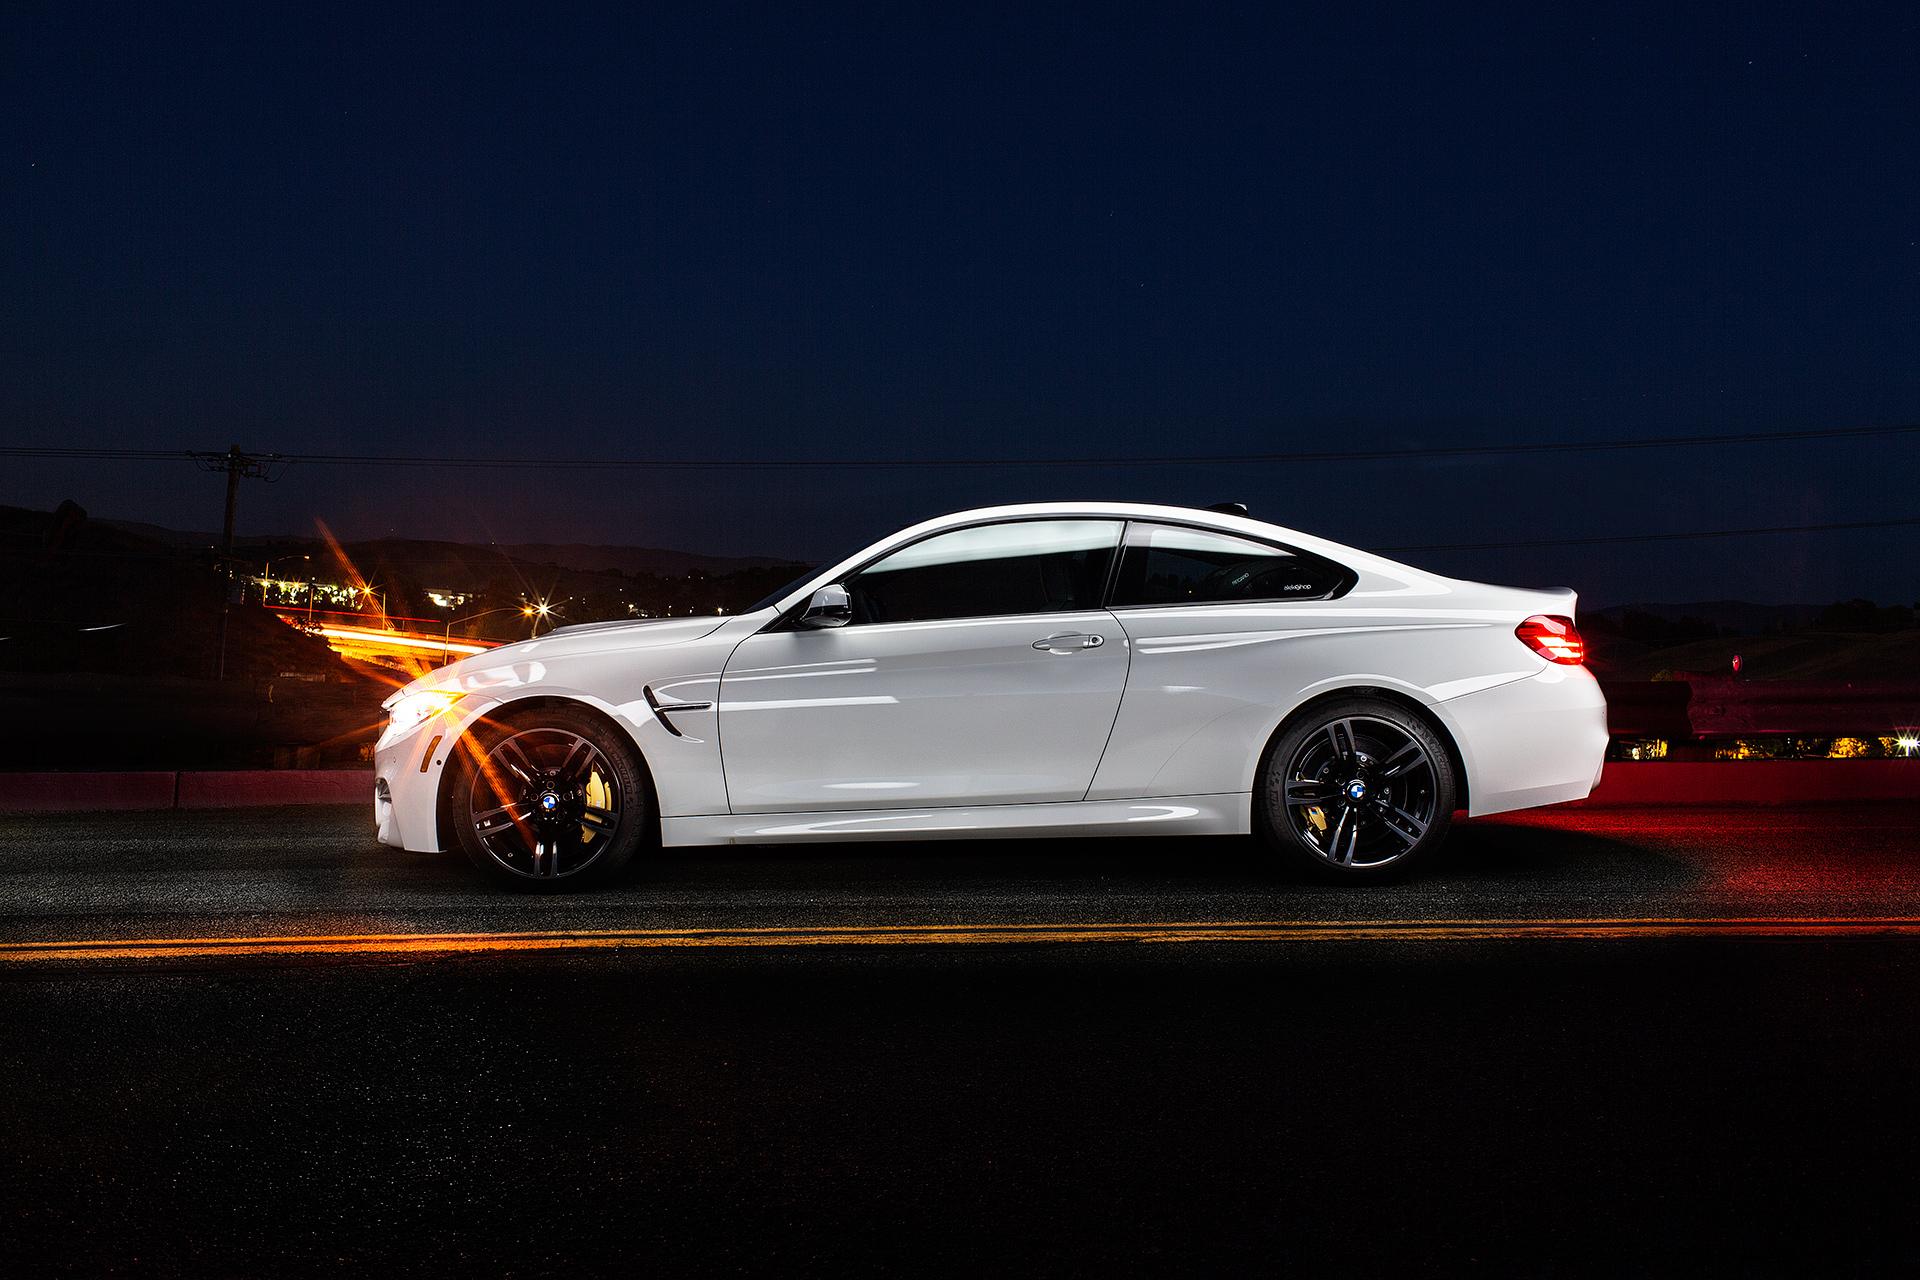 BMW M3 HD Wallpaper | Background Image | 1920x1280 | ID ...